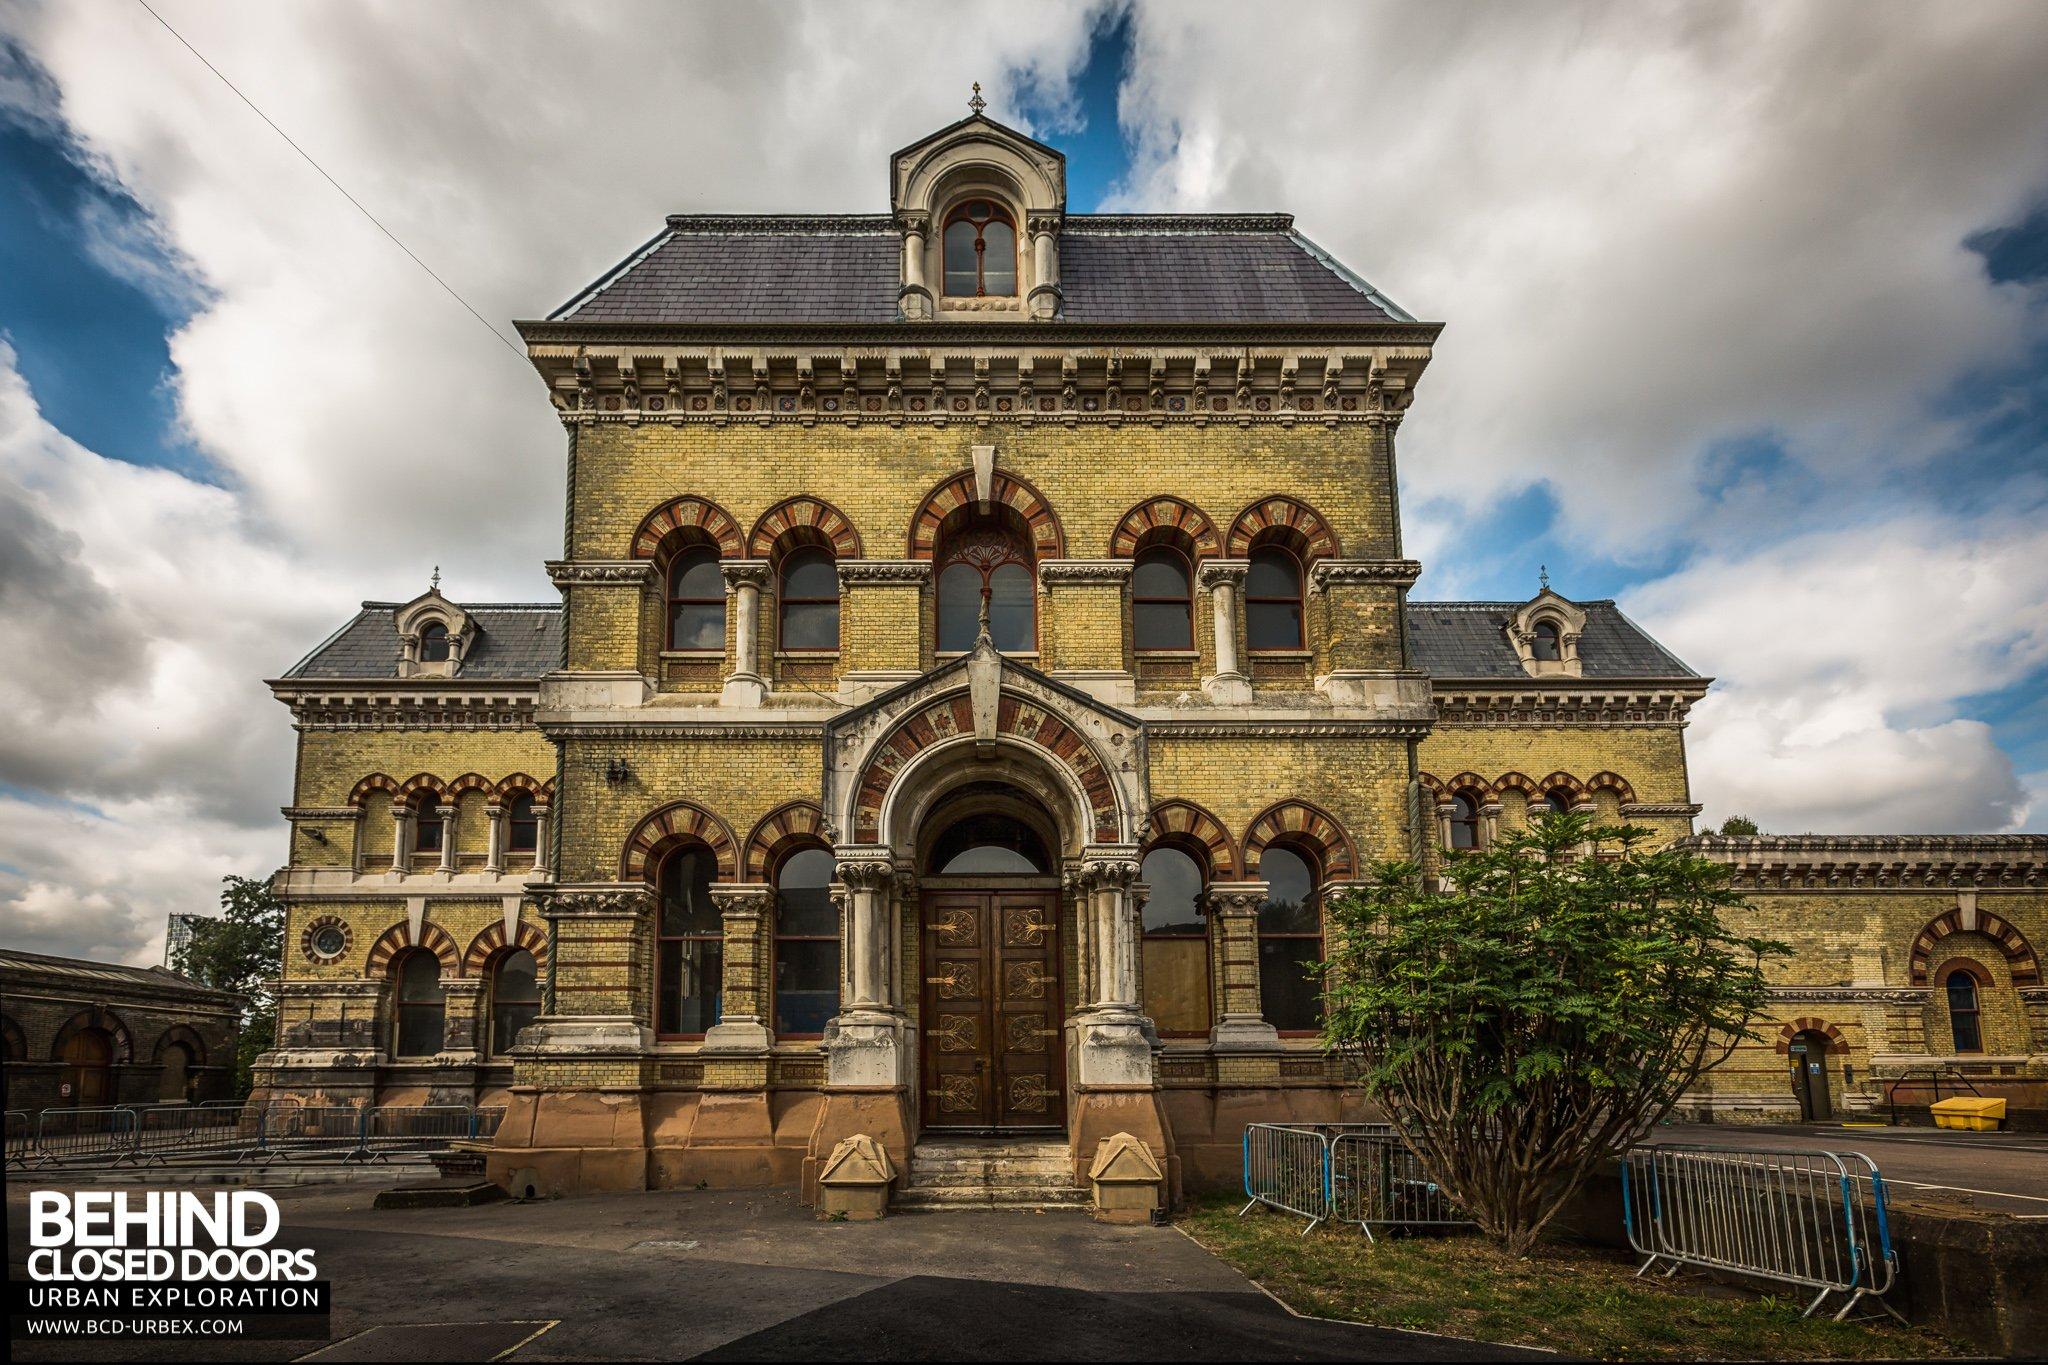 Abbey Mills Pumping Station \u2013 Grand ornate doors & Abbey Mills Pumping Station London UK » Urbex | Behind Closed ...